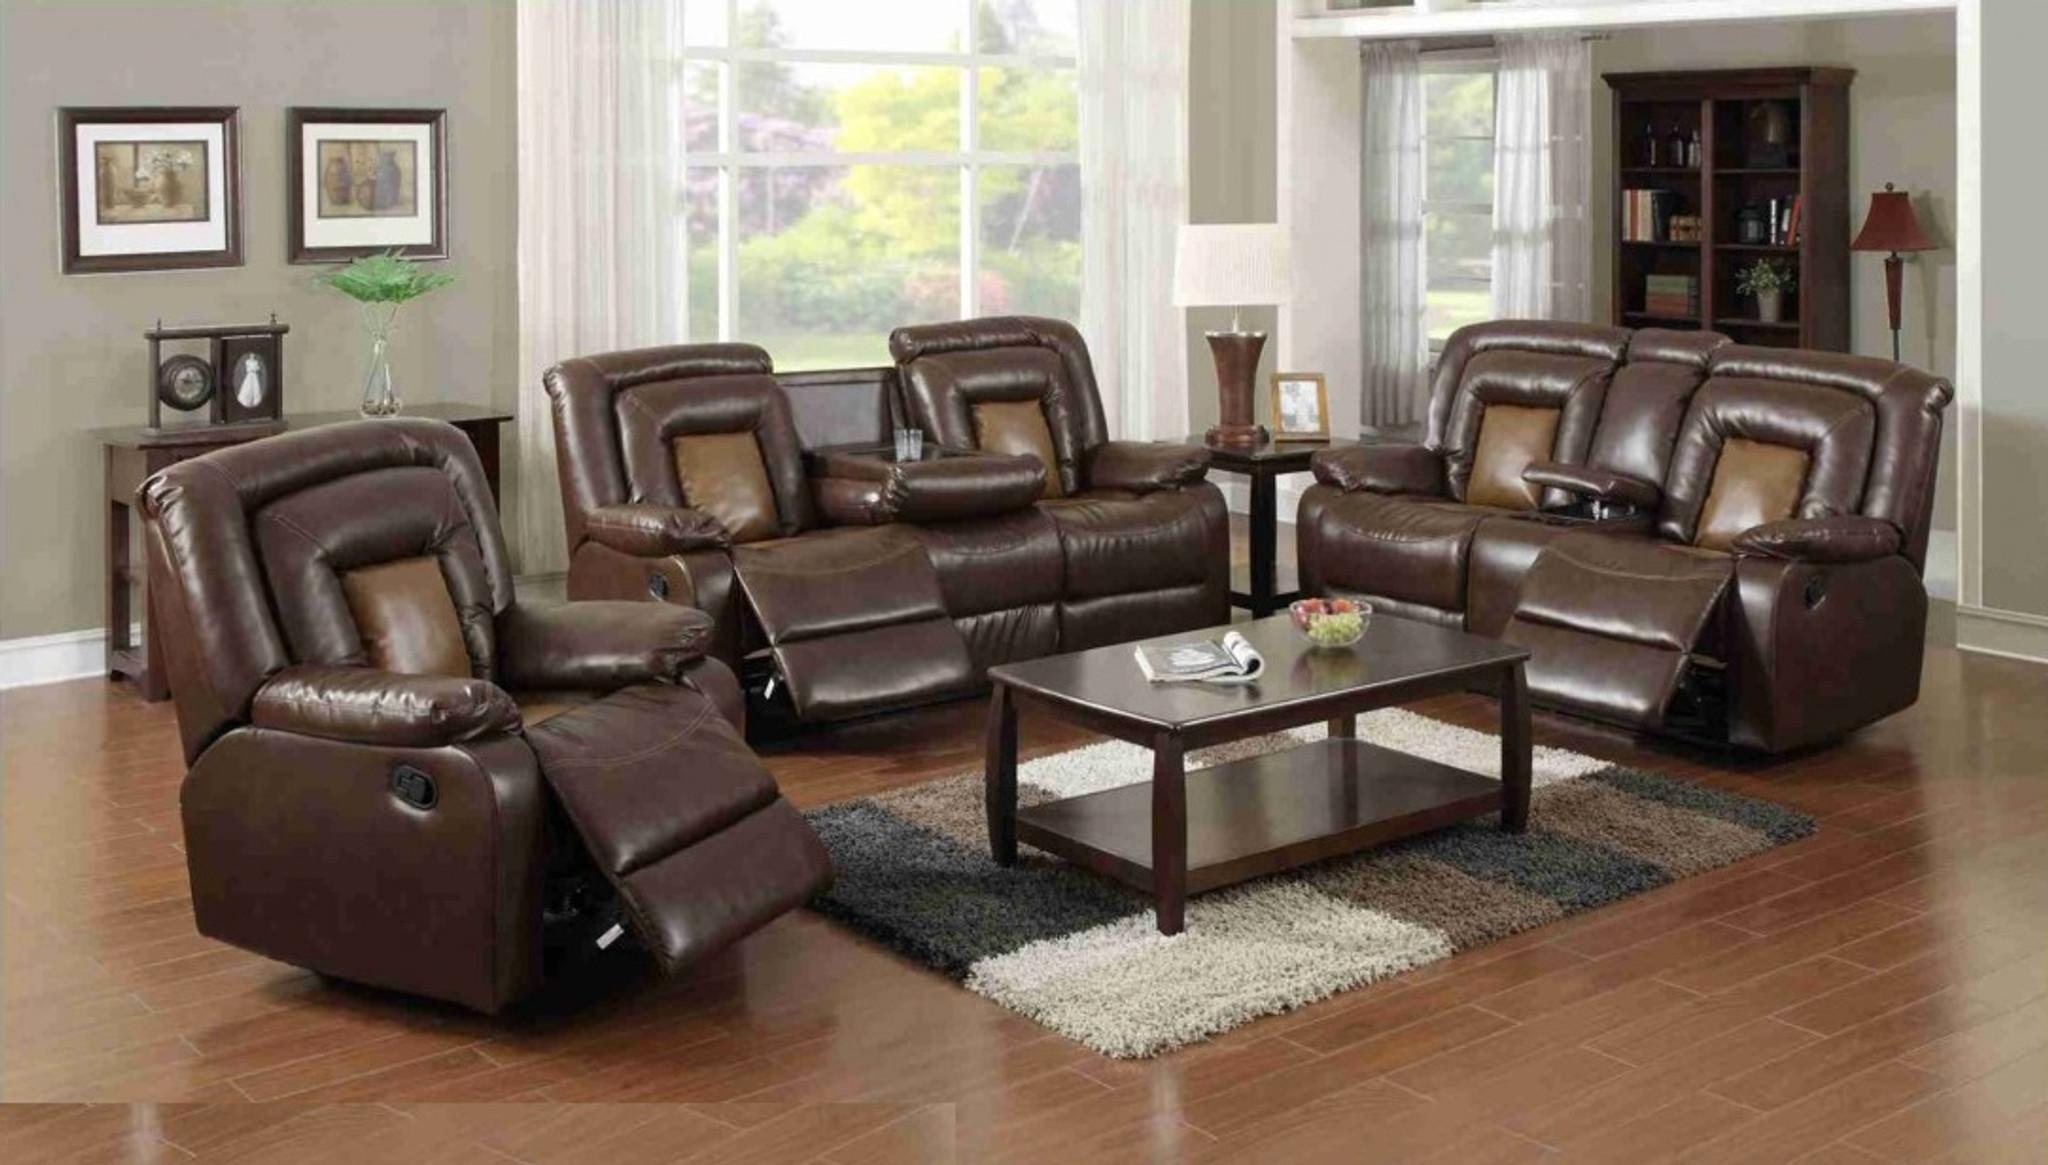 3 Pcs 2 Tone Recliner Living Room Set Sofa Loveseat Single Recliner Kassa Mall Home Furniture